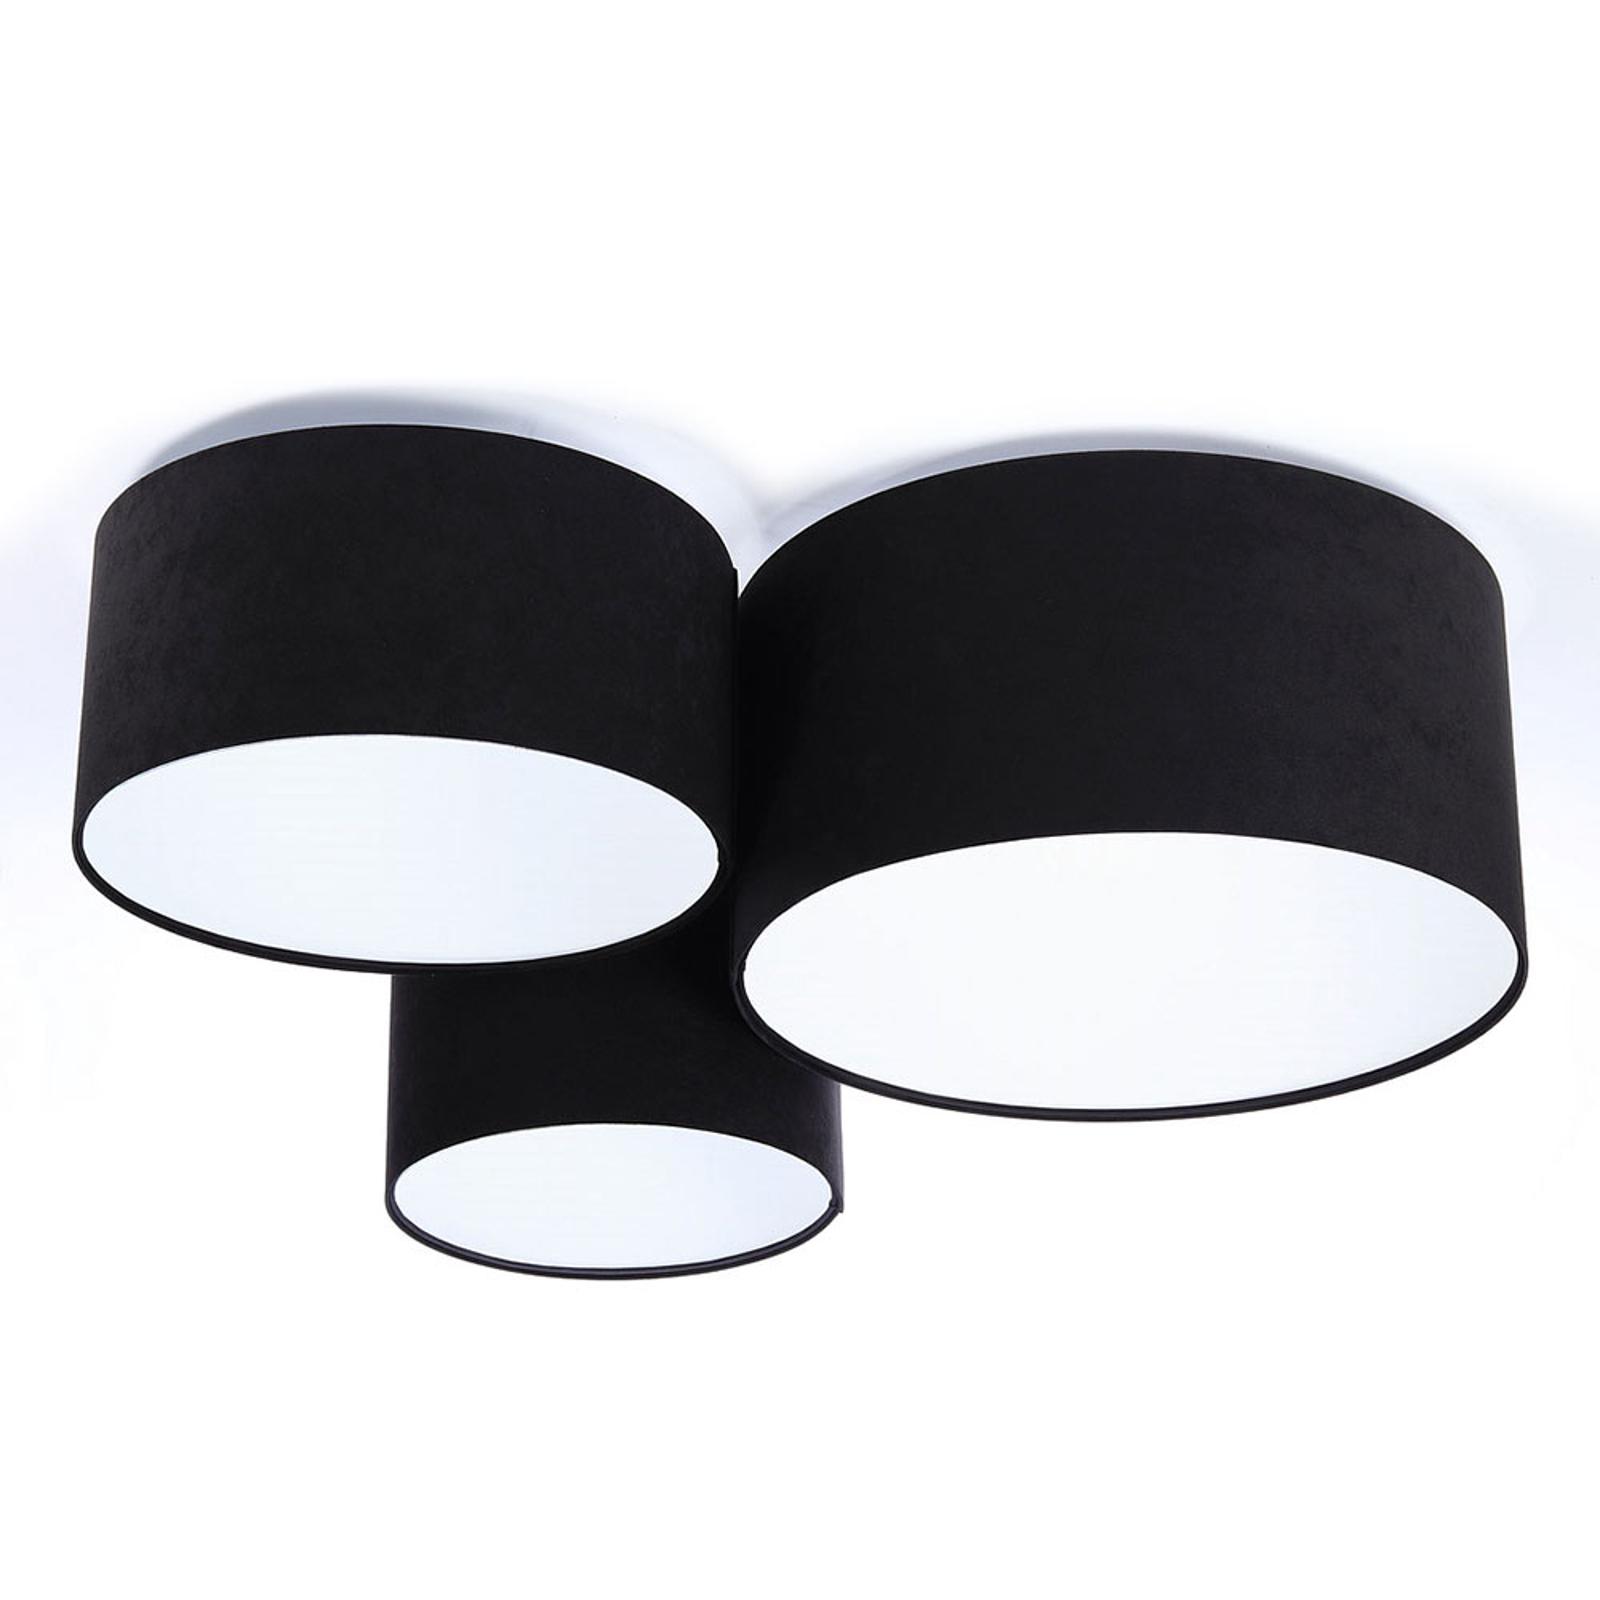 Lampa sufitowa 080, 3-punktowa, czarno-biała